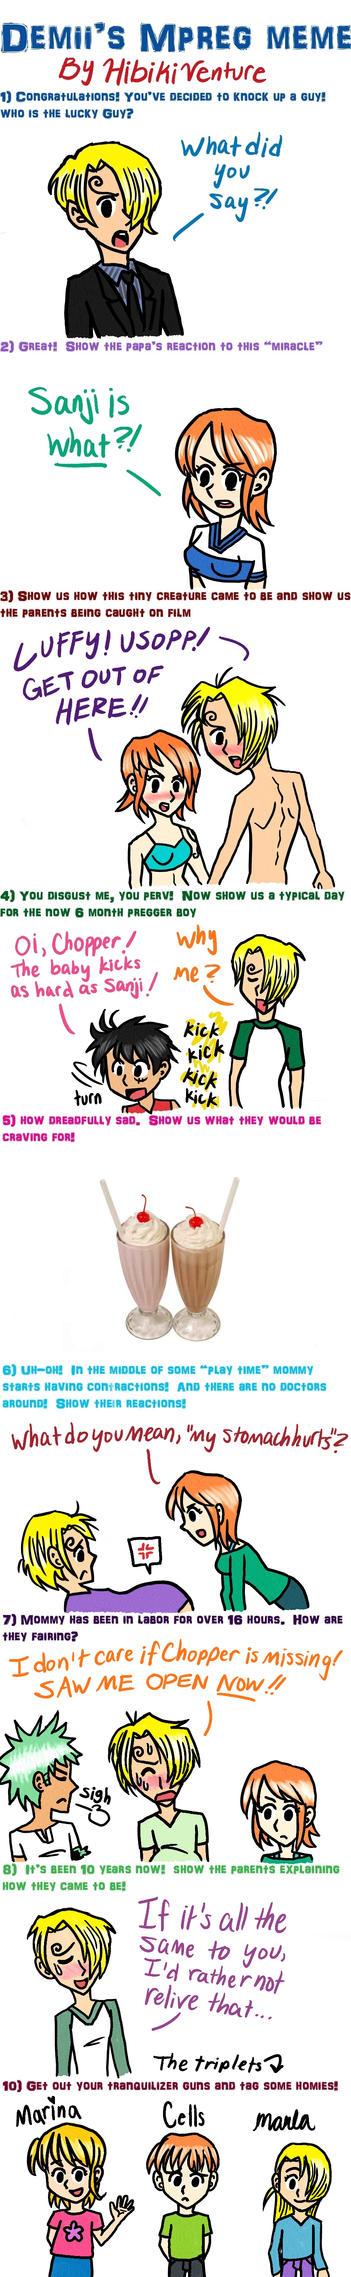 One Piece Mpreg Meme by HibikiVenture